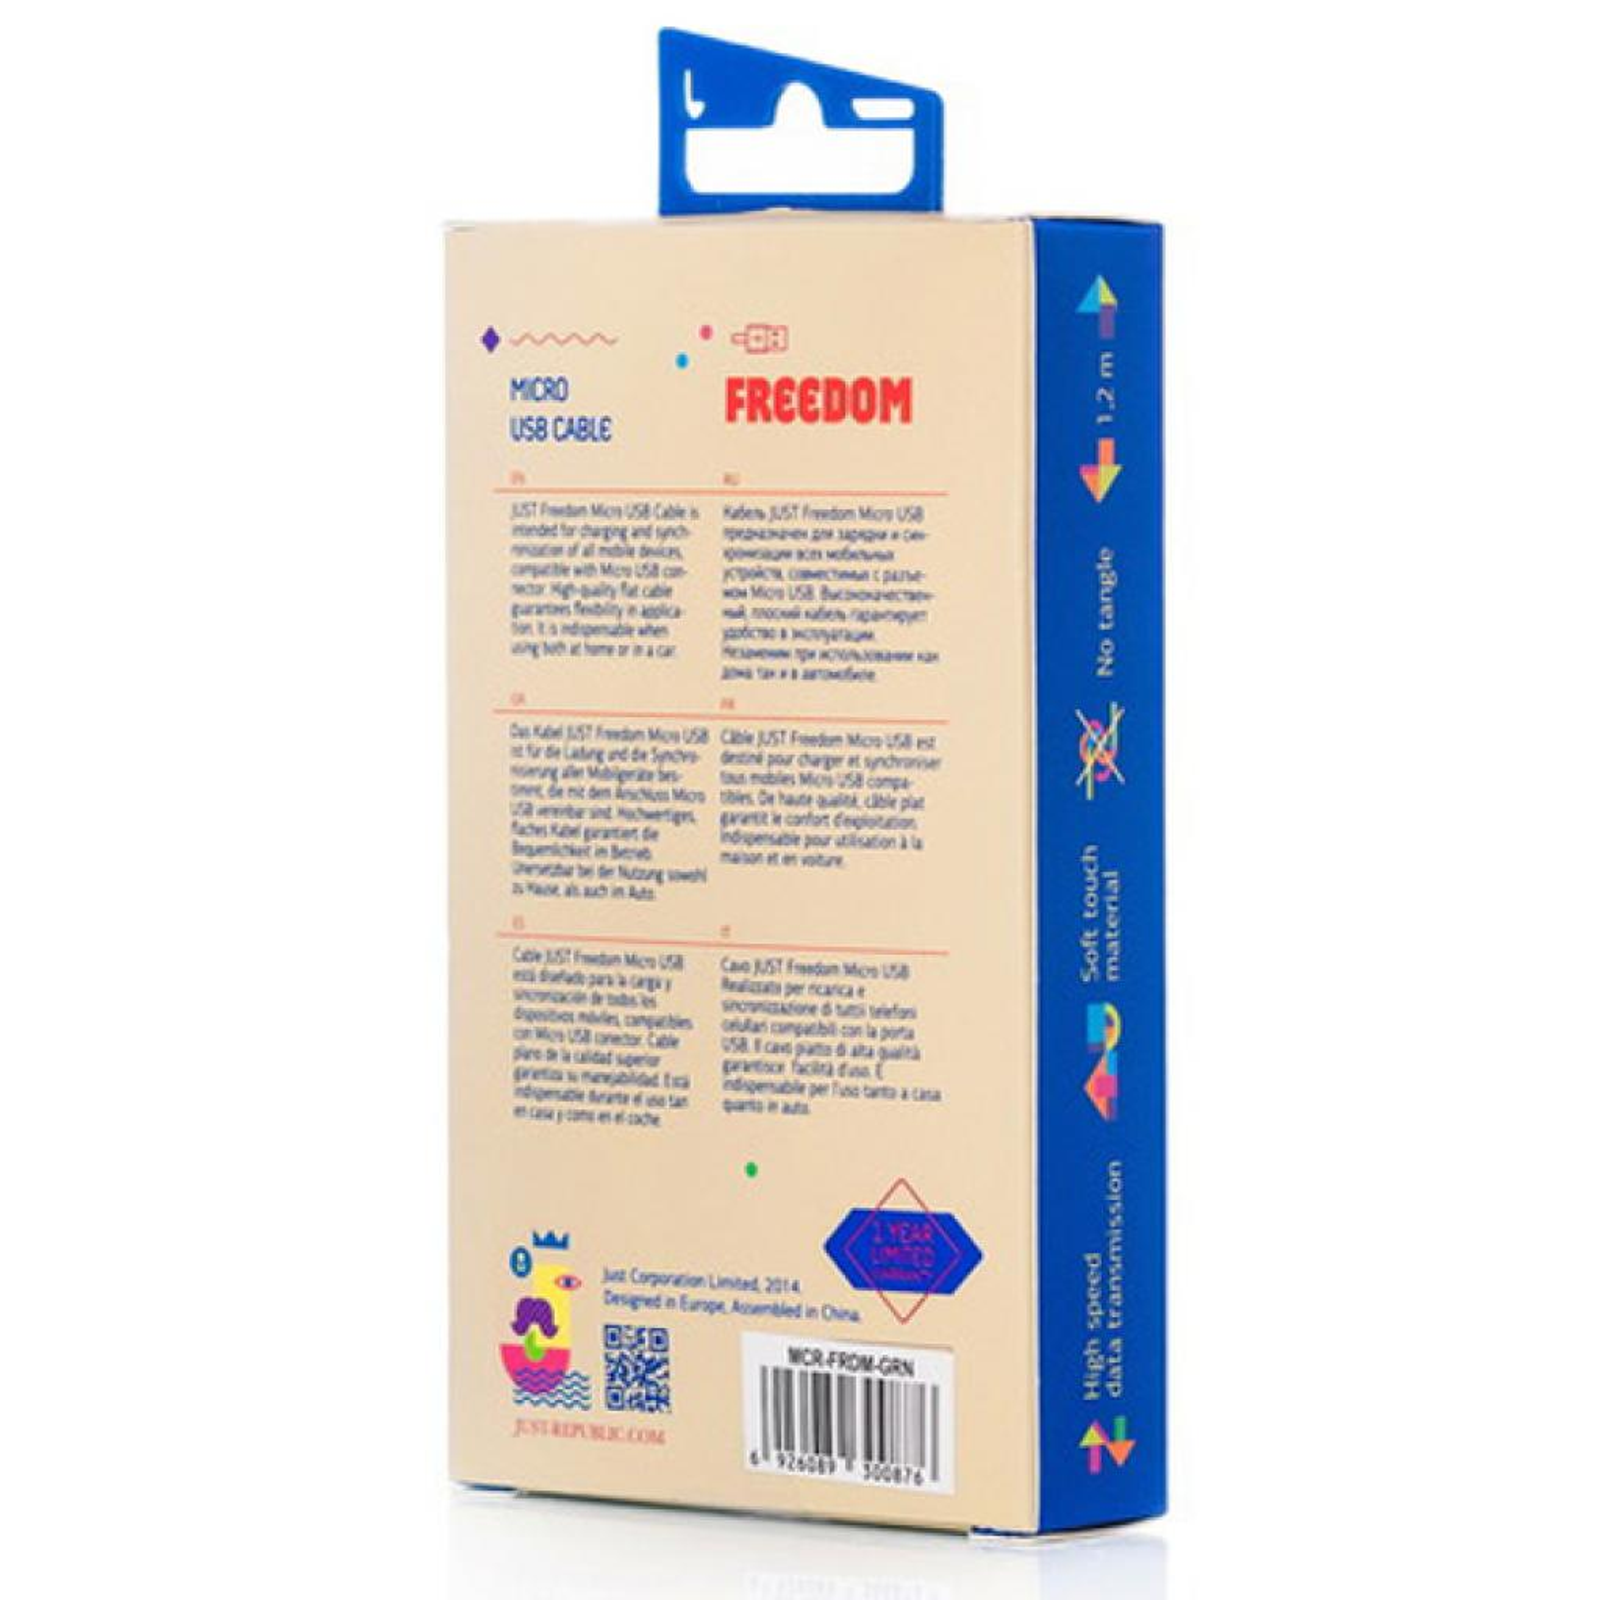 Дата кабель JUST Freedom Micro USB Cable White (MCR-FRDM-WHT) изображение 4